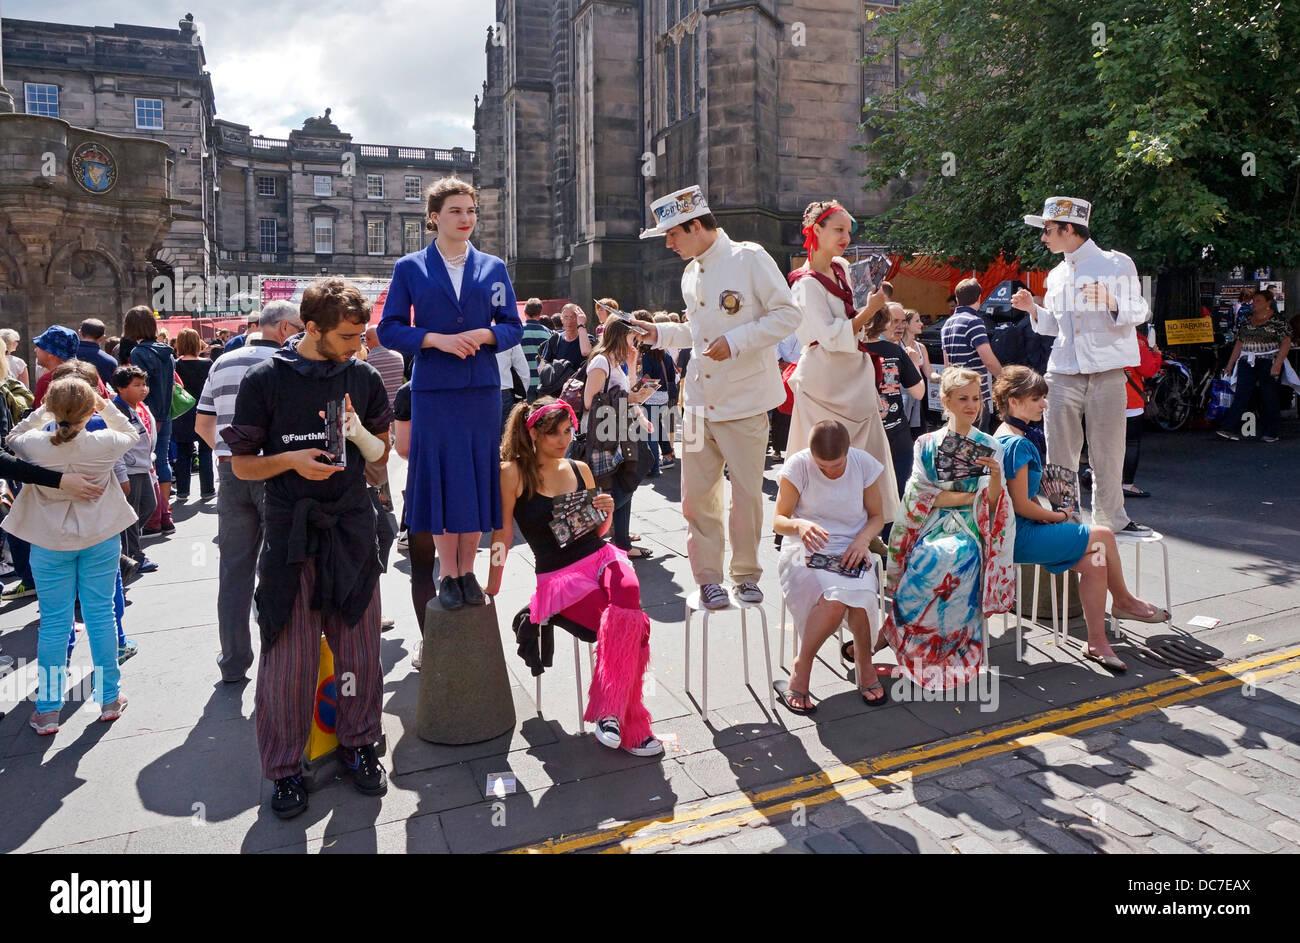 Fringe performers Fourth Monkey promoting shows in The Royal Mile Edinburgh during the 2013 Edinburgh Festival Fringe - Stock Image